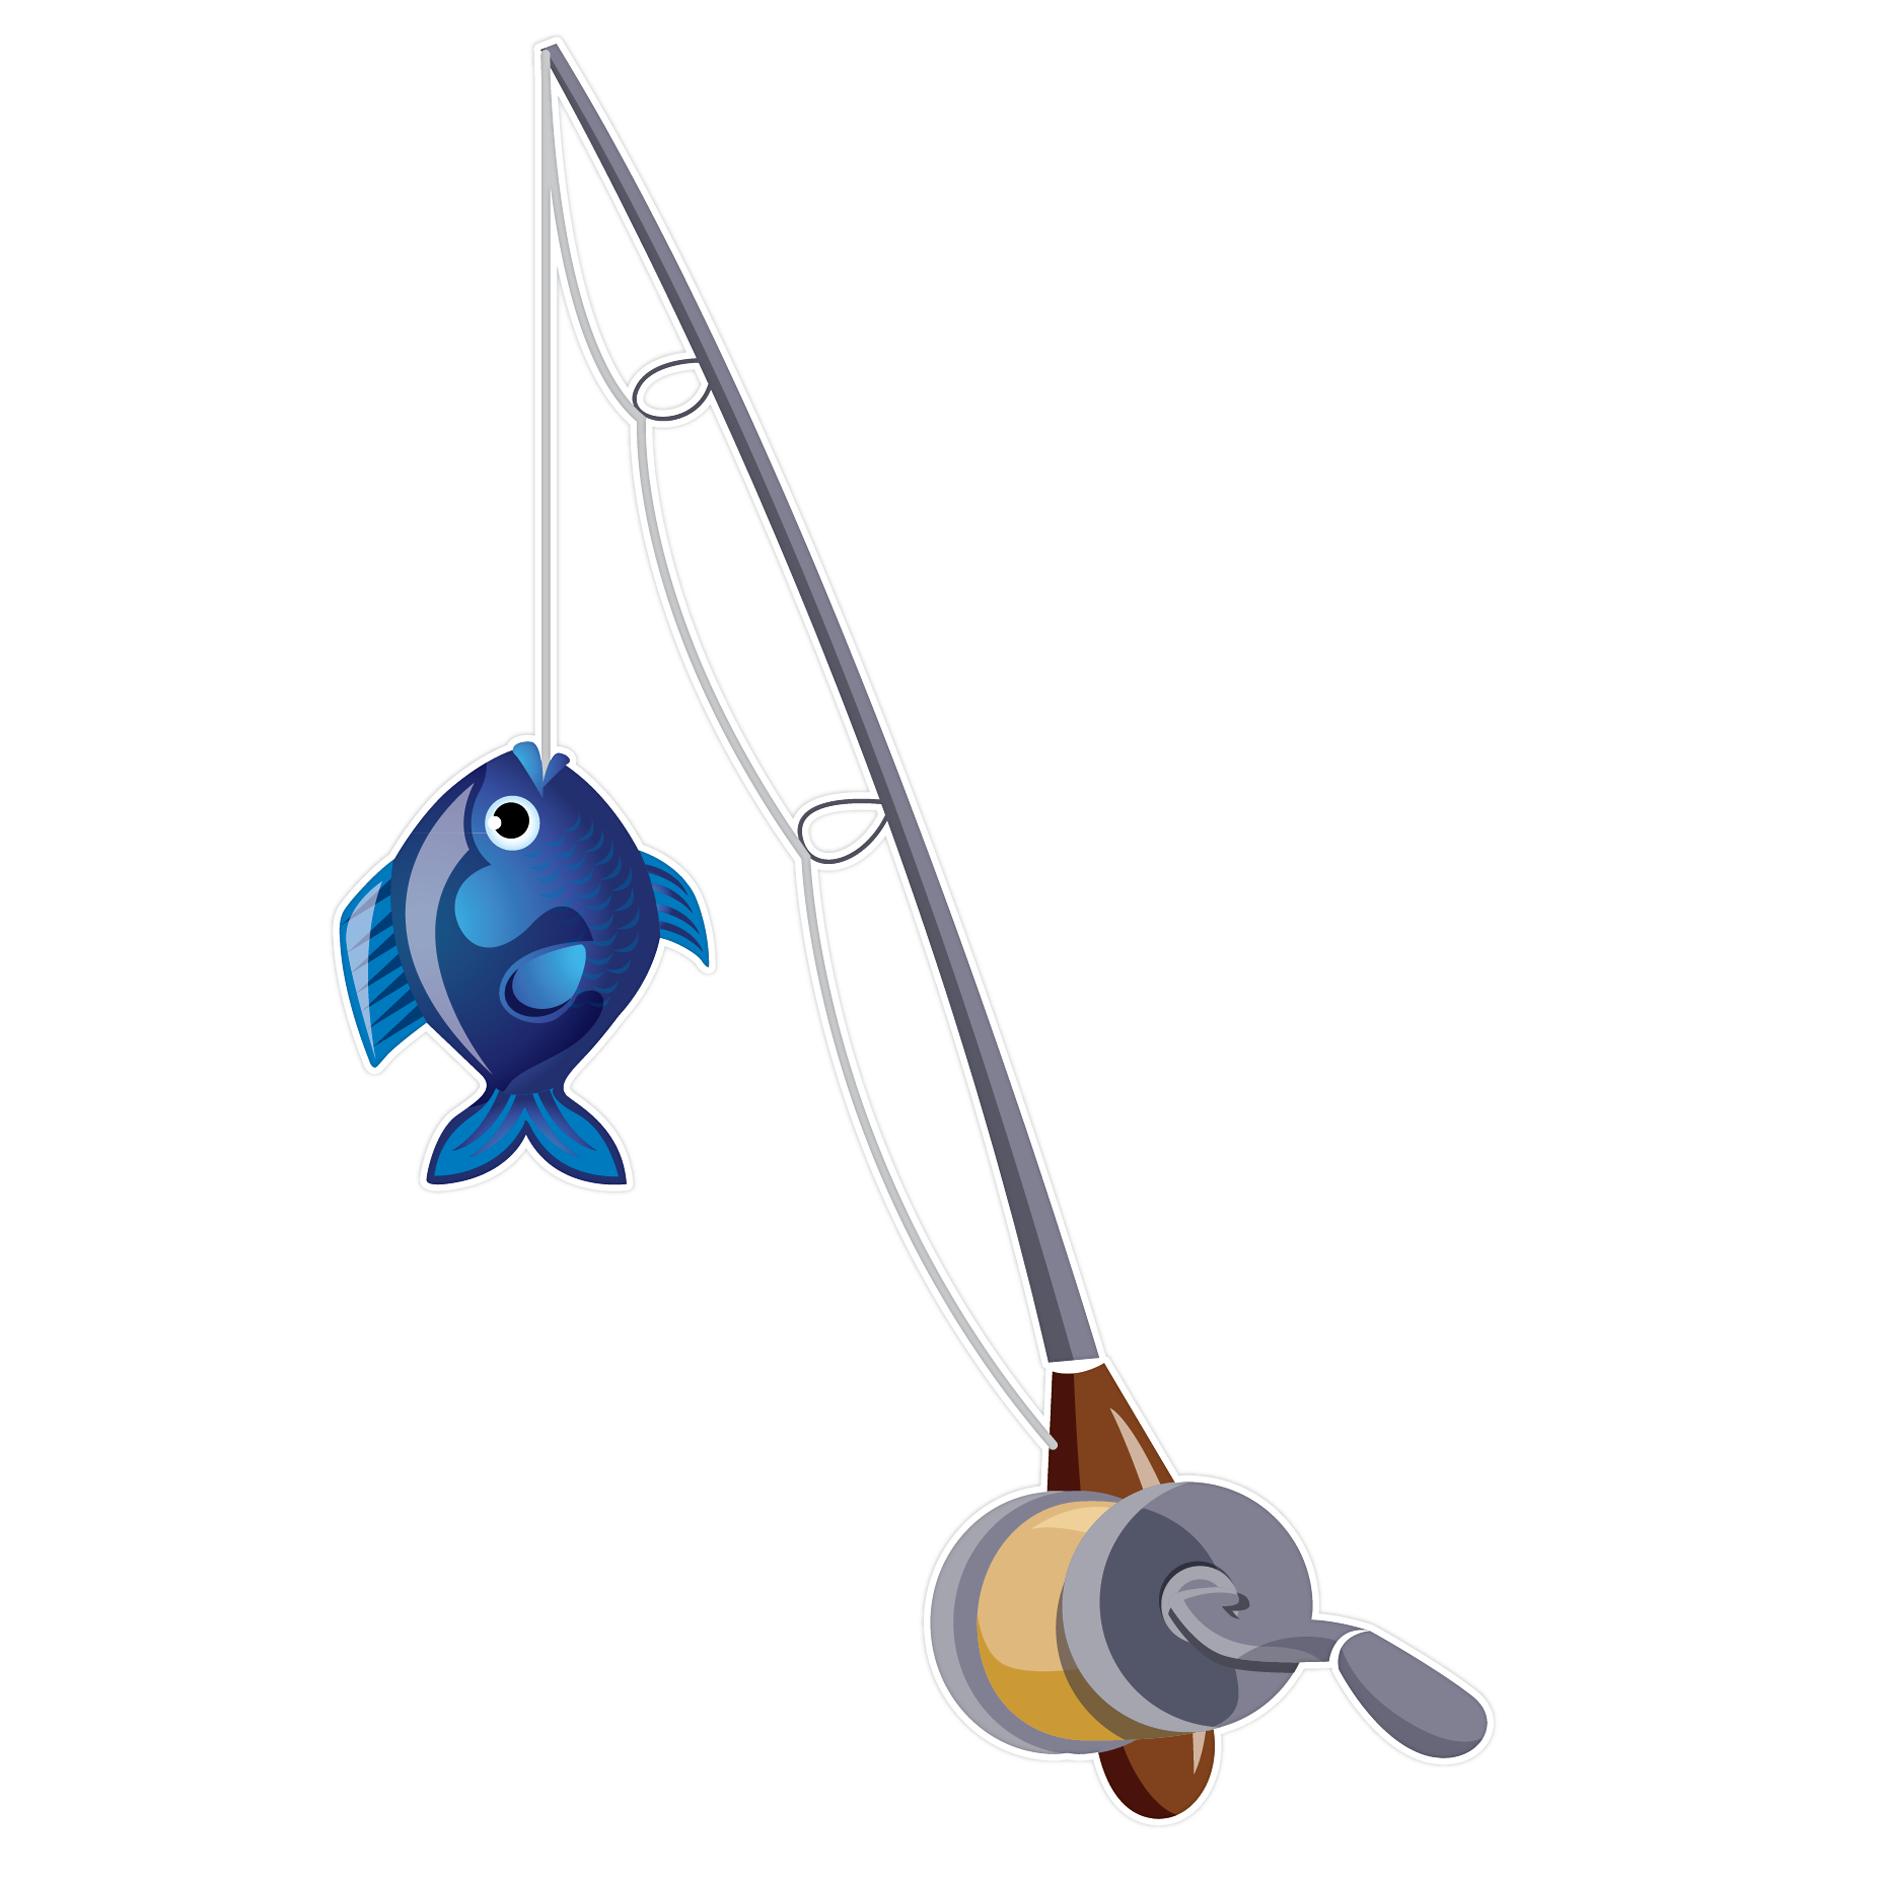 1879x1879 Fishing Pole Clipart Fishing Rod Image 3